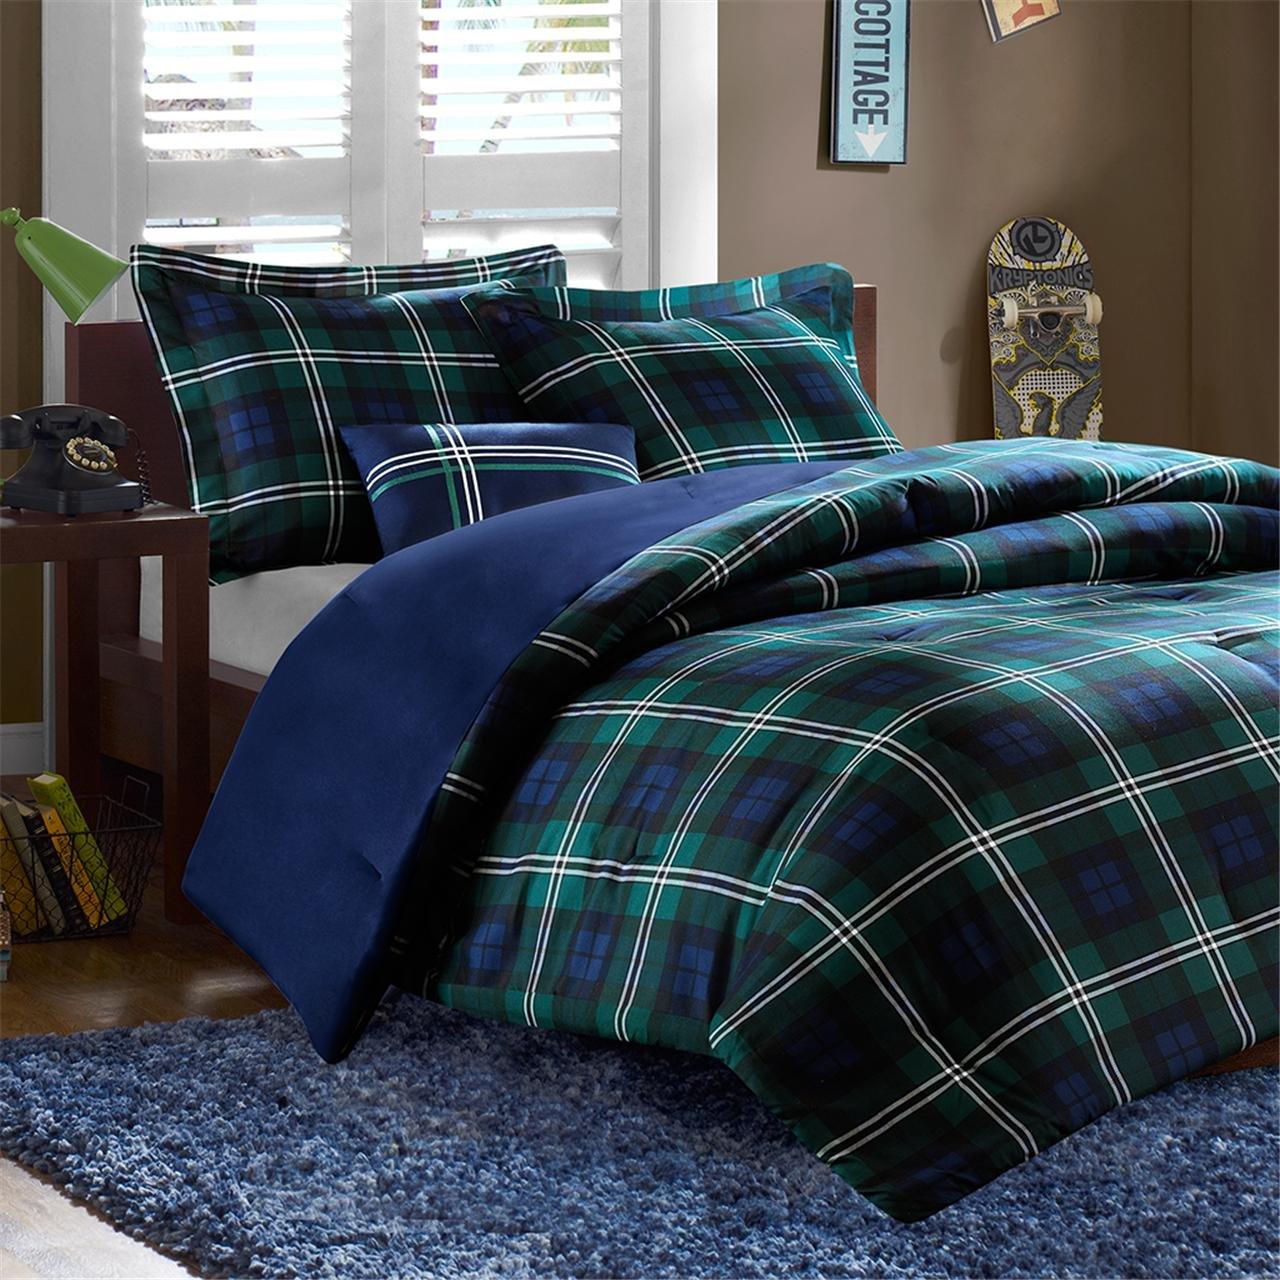 Blue & Green Plaid Boys Full / Queen Comforter